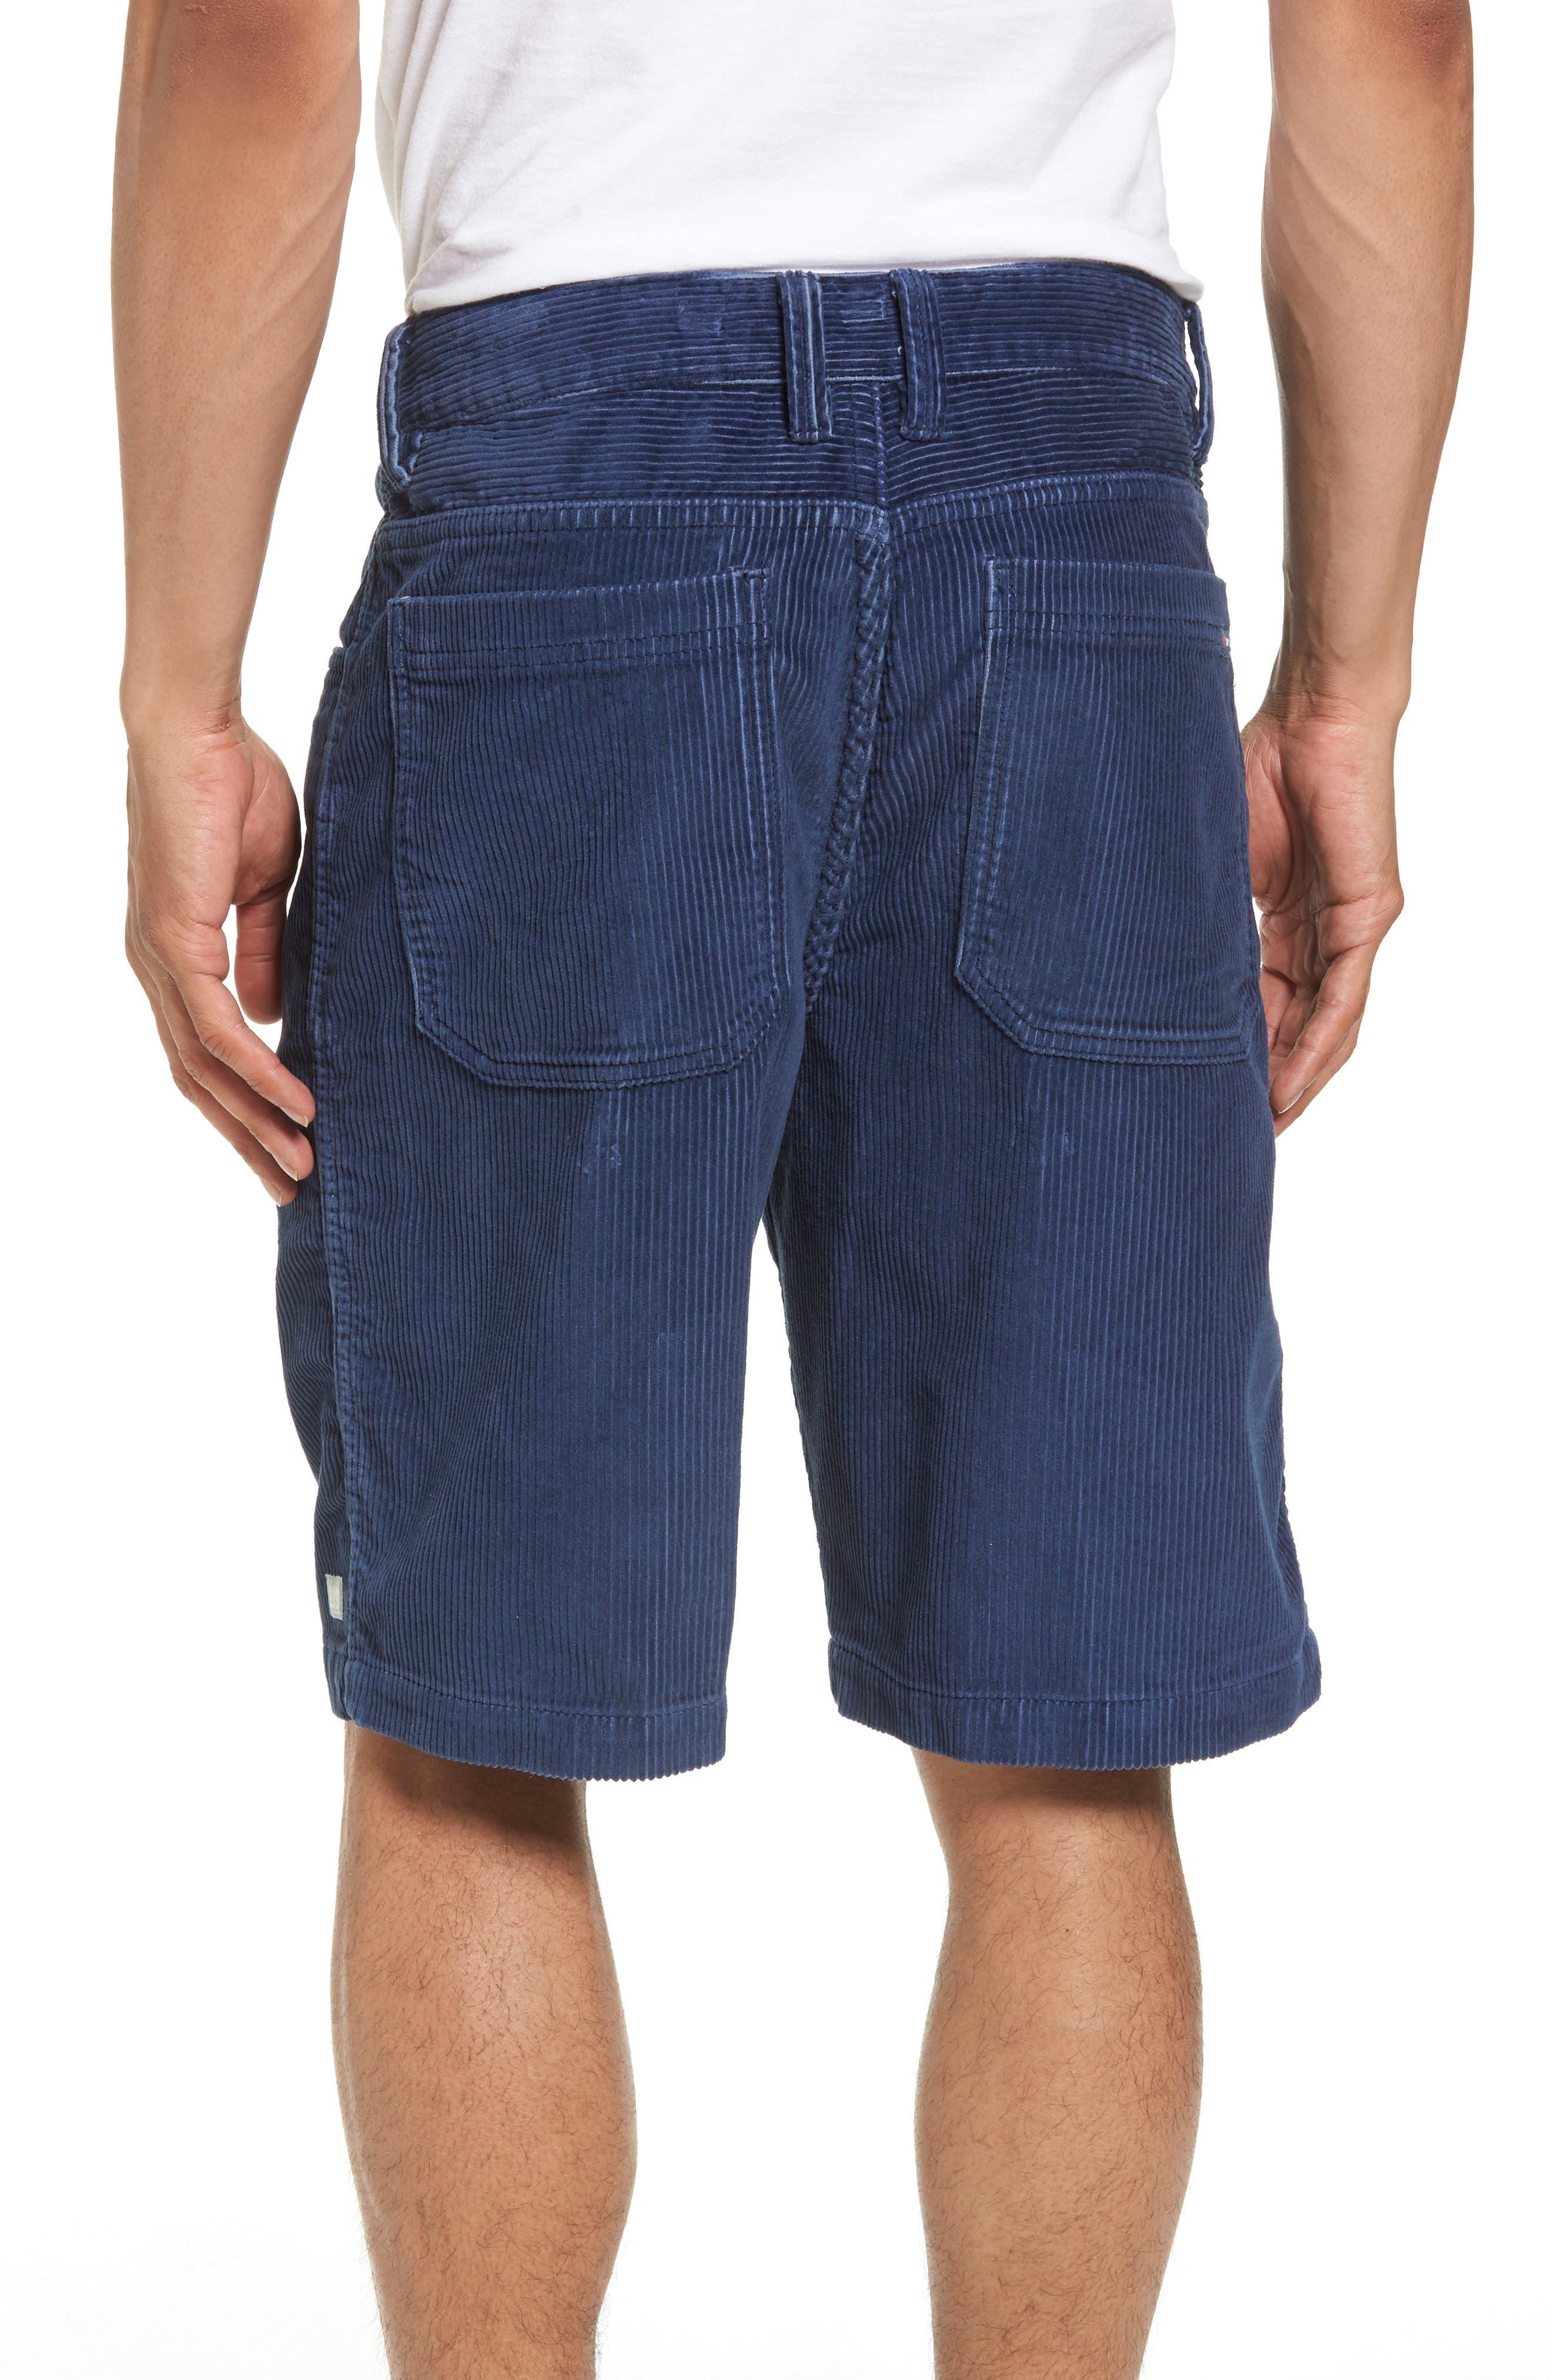 Kordo Corduroy Walking Shorts,                             Alternate thumbnail 2, color,                             410